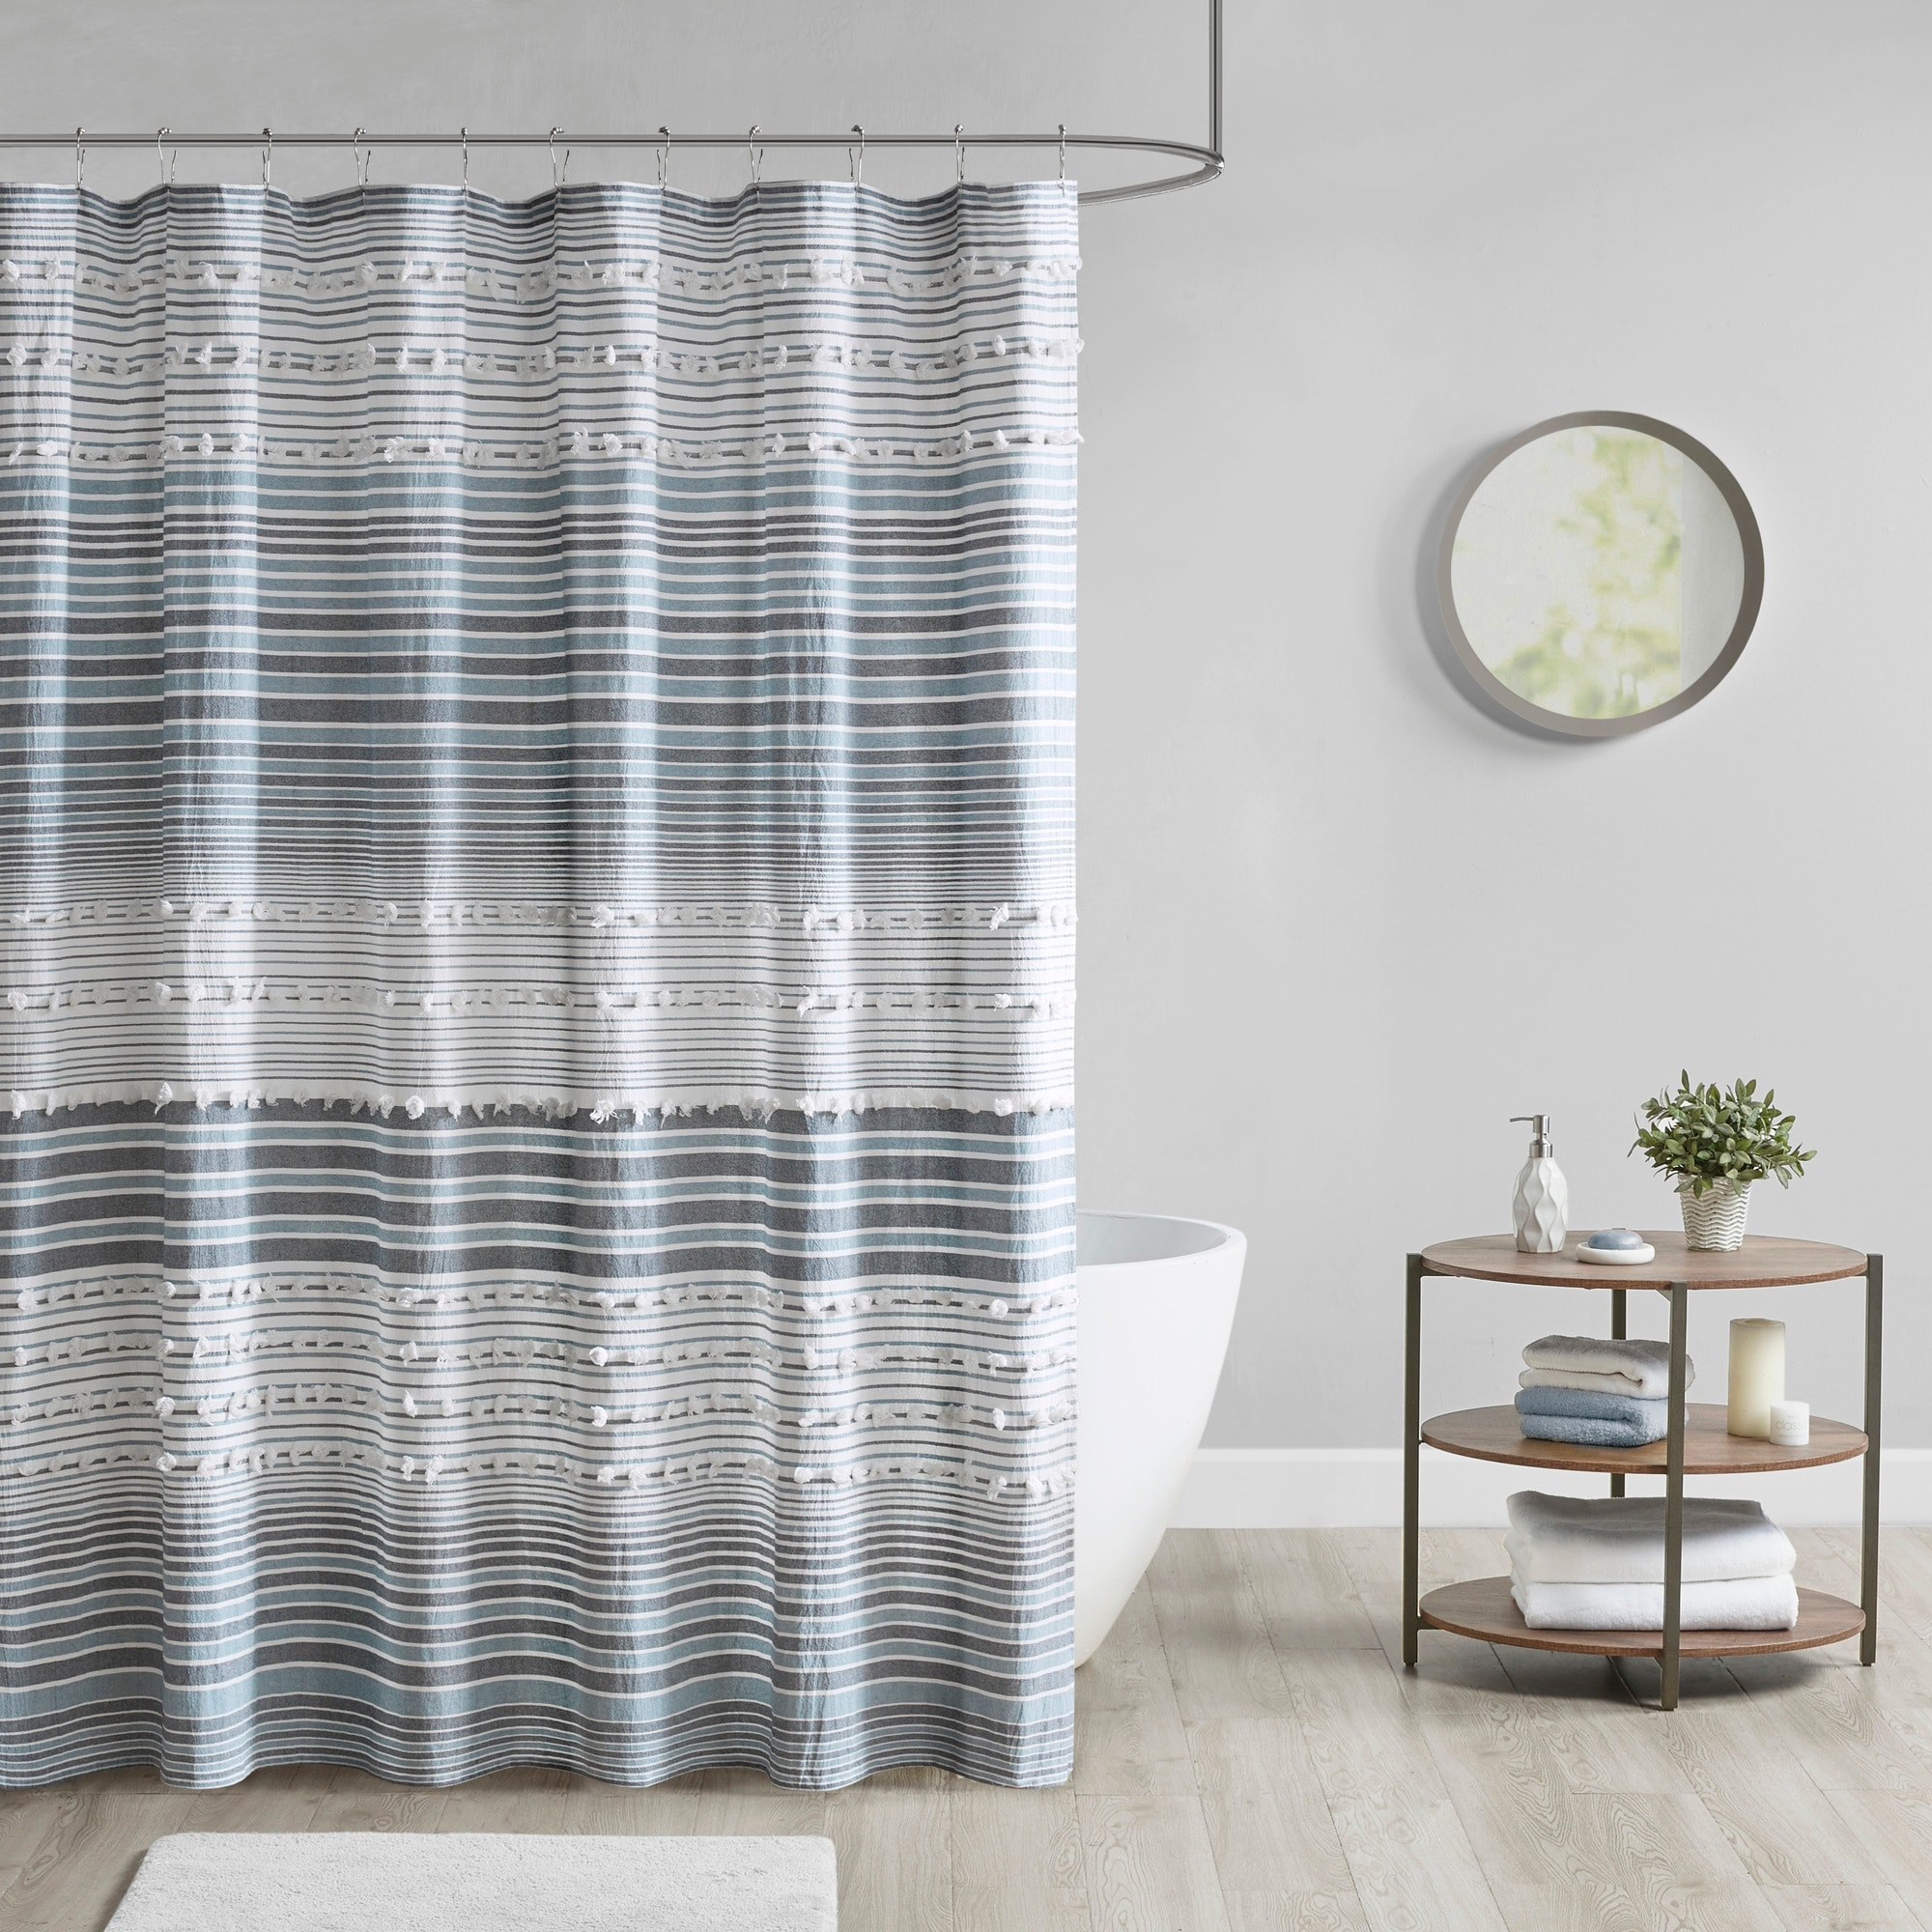 urban habitat charlie cotton yarn dye shower curtain with pom poms